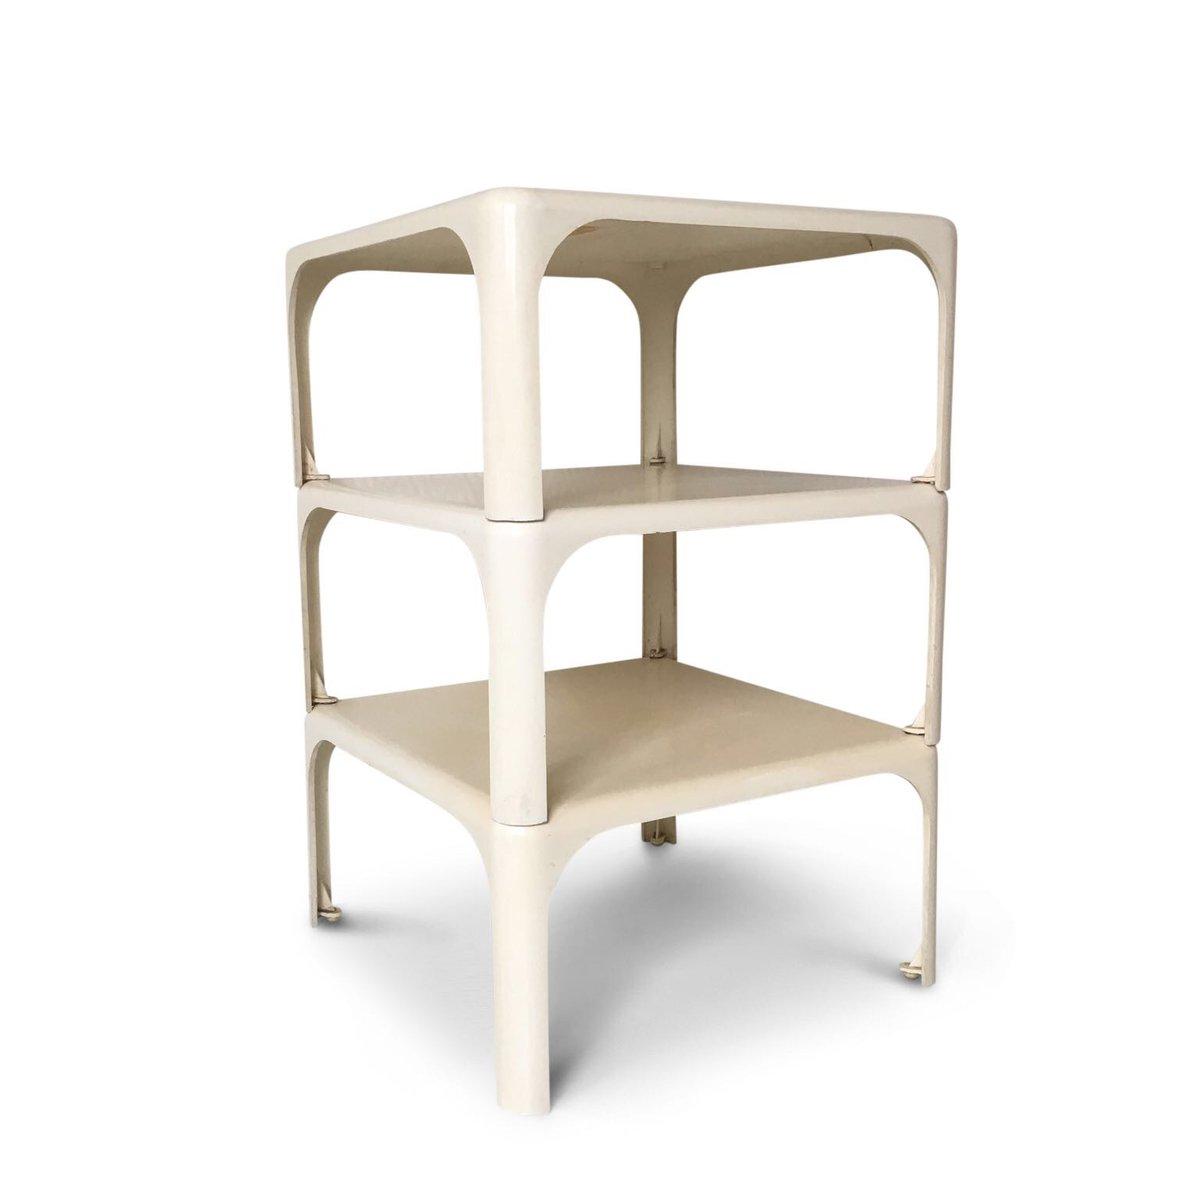 demetrio  stackable tables by vico magistretti for artemide s setof  for sale at pamono. demetrio  stackable tables by vico magistretti for artemide